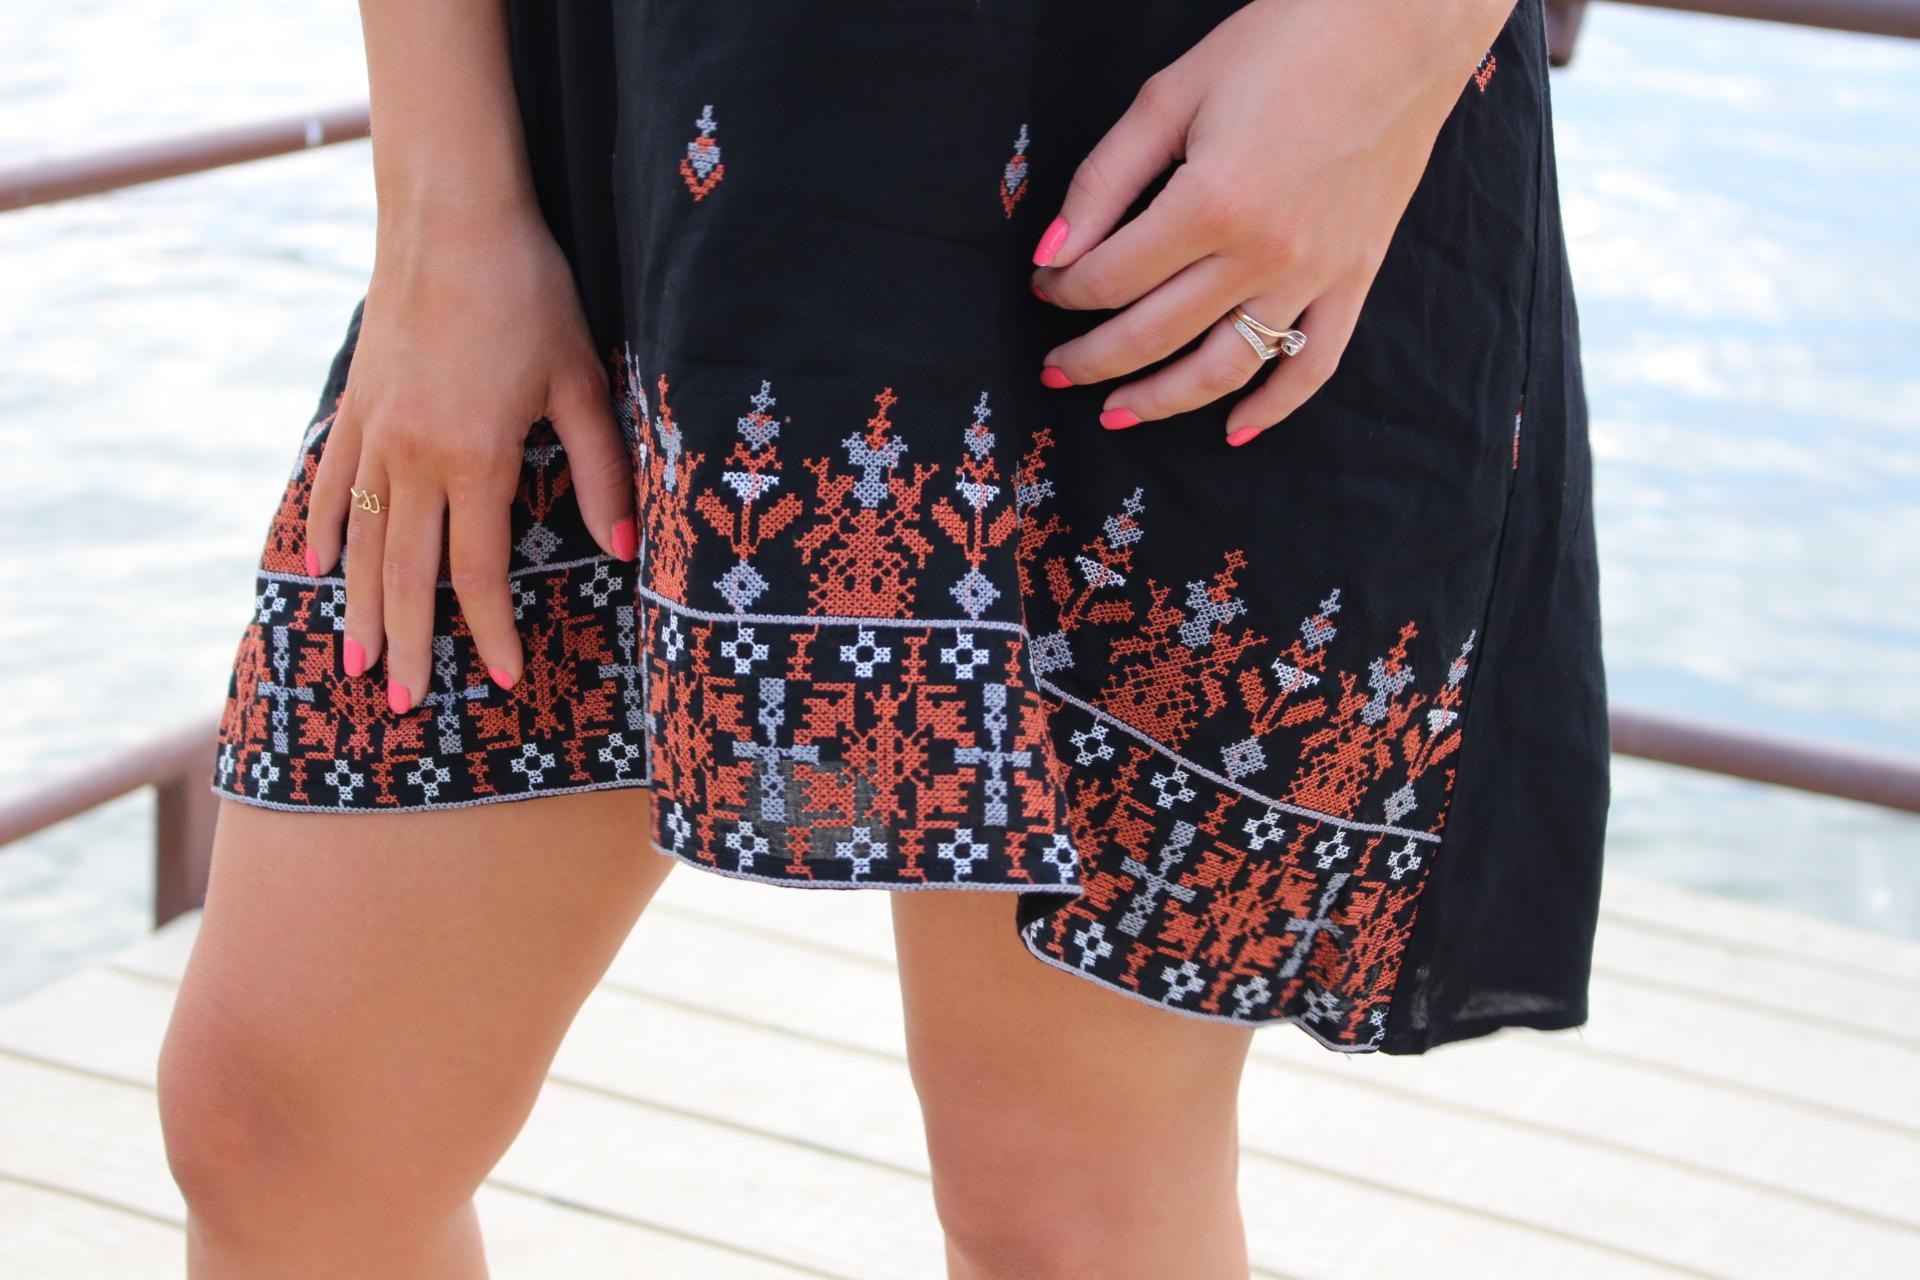 hot miami styles black babydoll OOTD steve madden wedges outfit date night summer dress quay australia sahara shades desi perkins dress details by Alejandra Avila Tufashionpetite